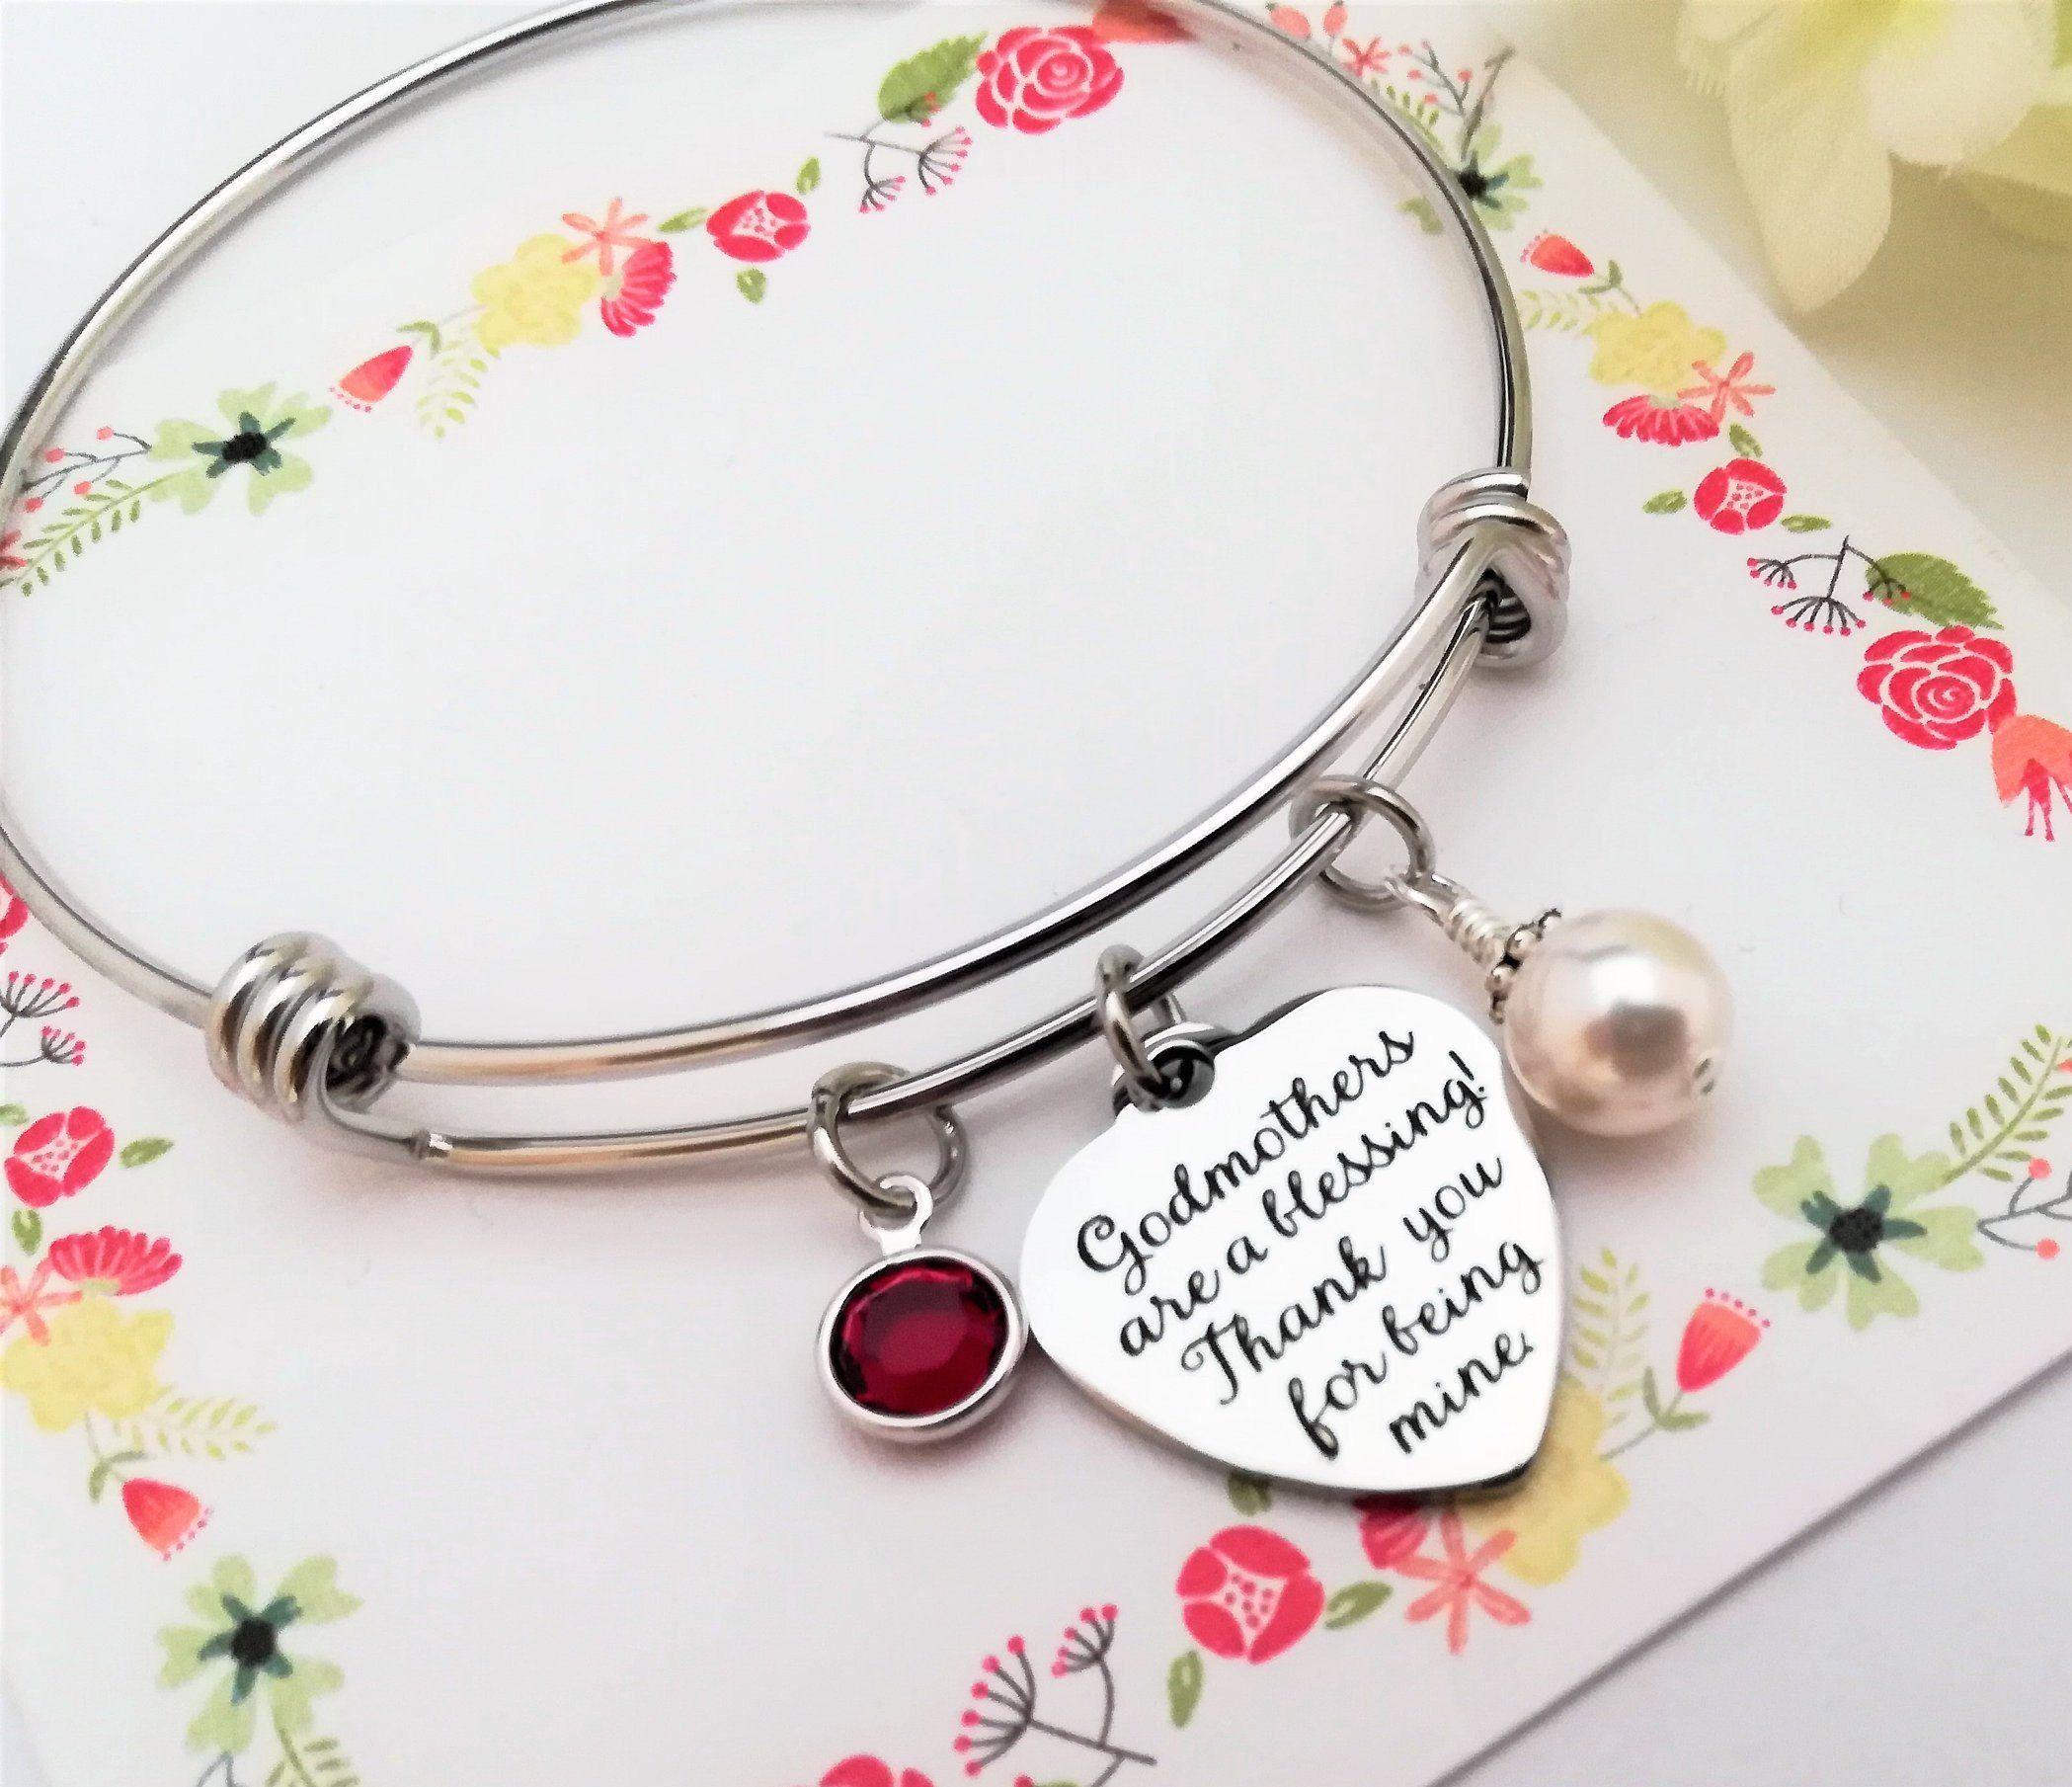 Godparent Gift Godmother Proposal Godmother Gift Godmother Bracelet Gifts for Godmother Thank you Gift for Godmother